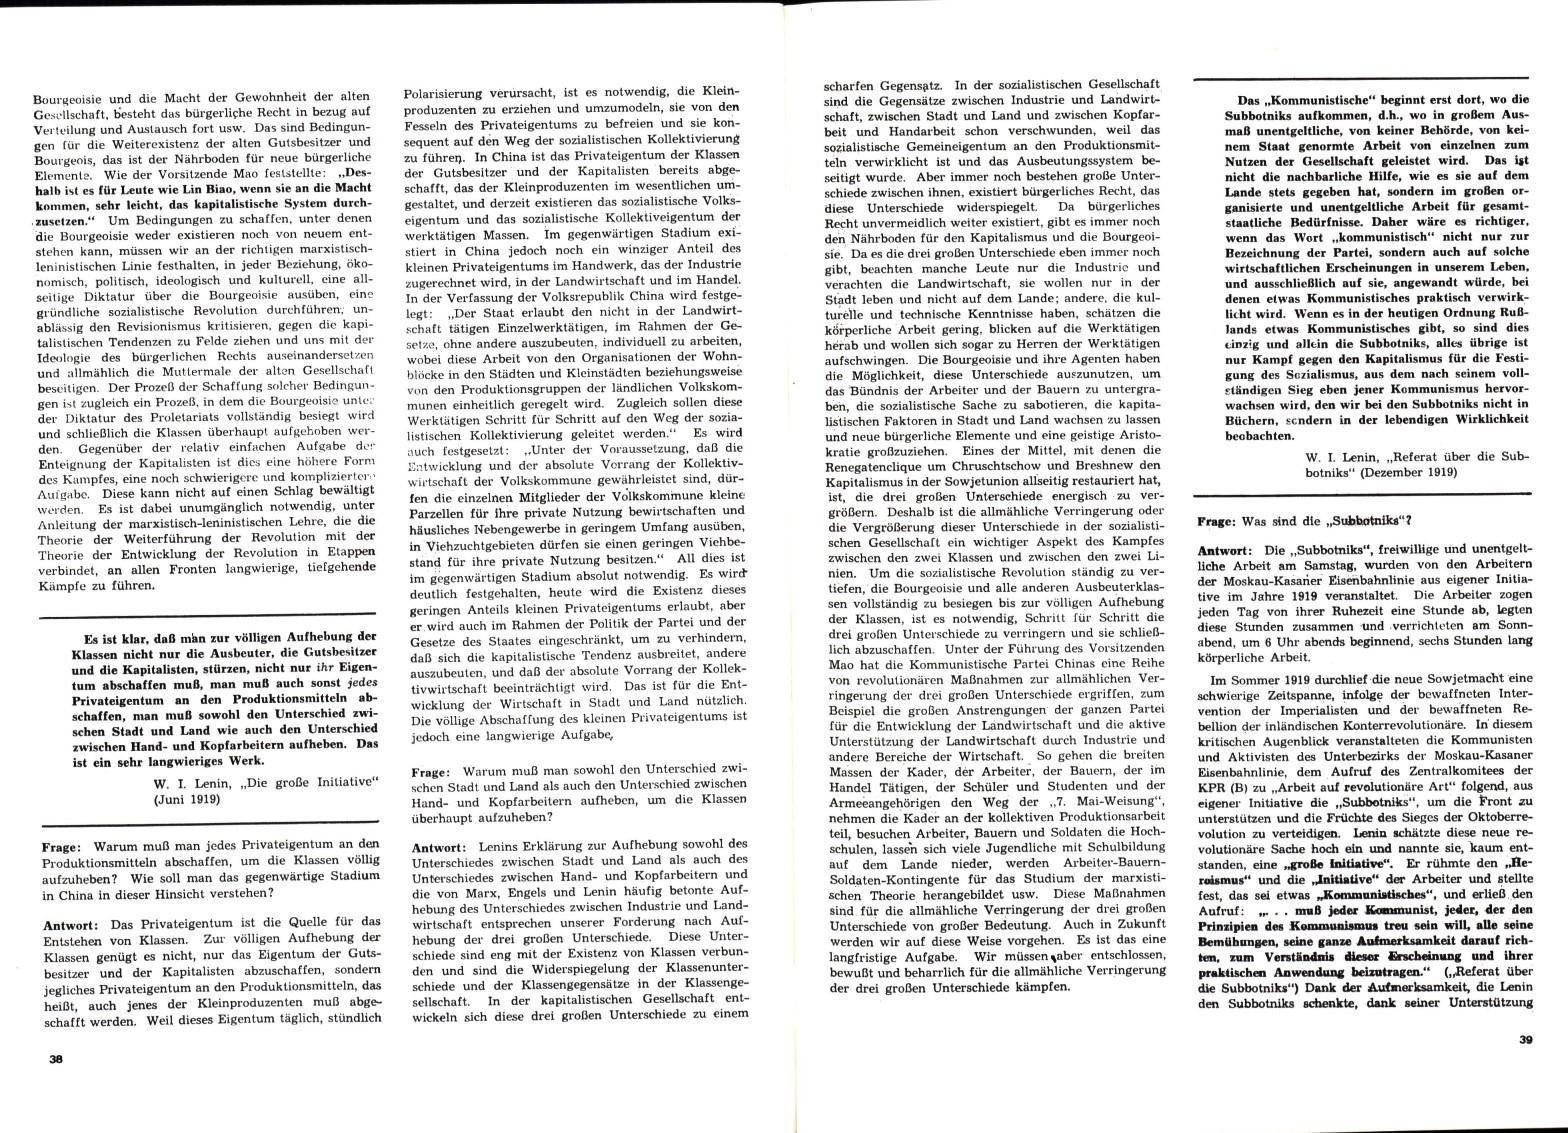 KPDAO_1976_Es_lebe_die_Diktatur_des_Proletariats_22